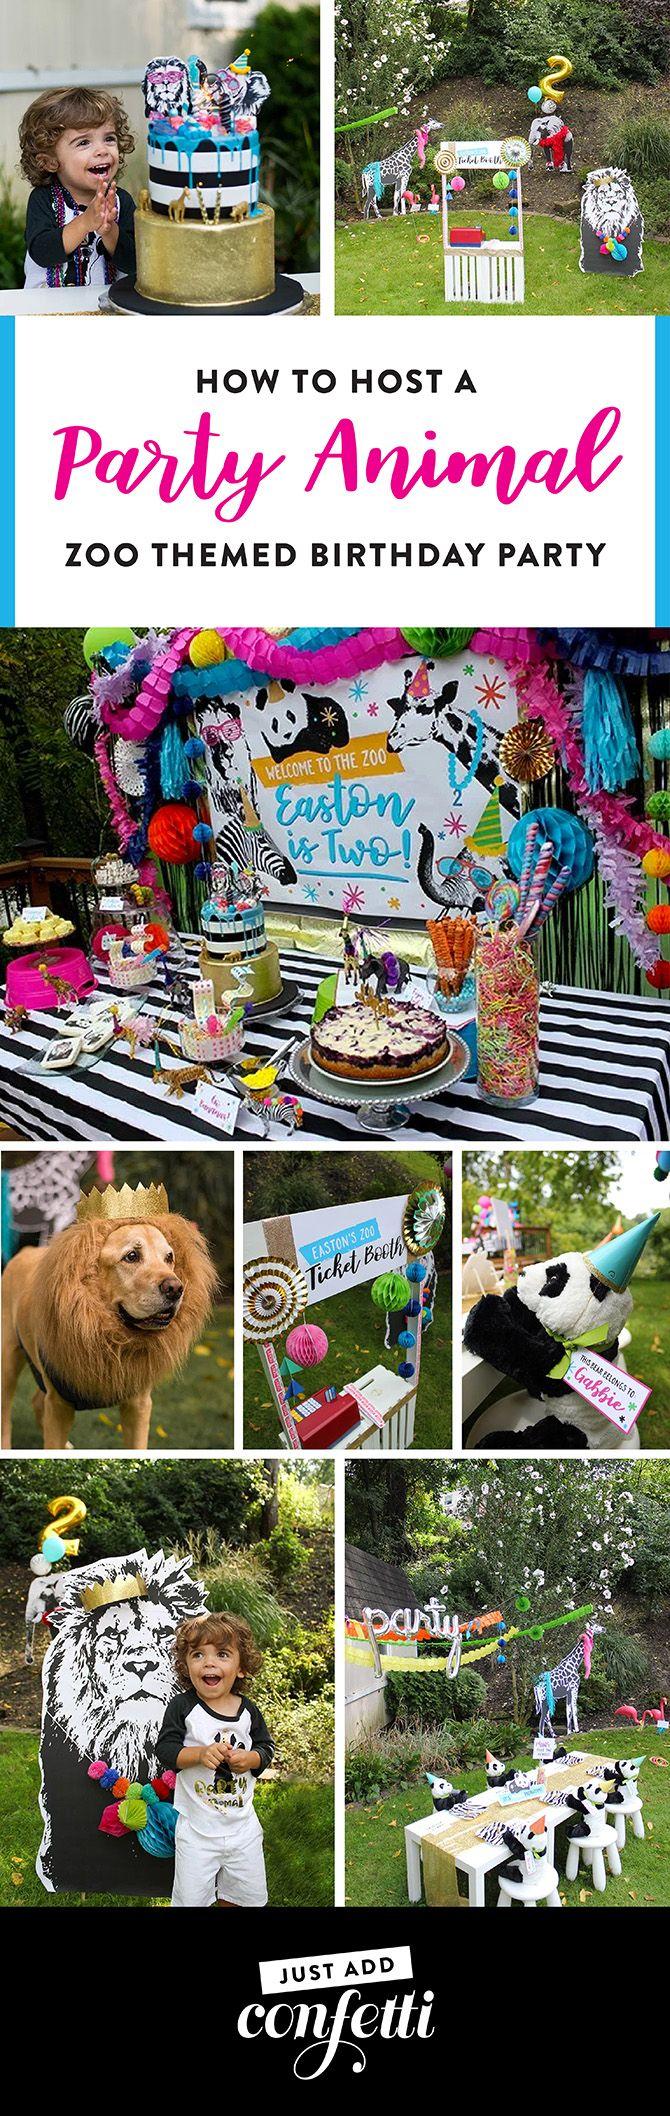 Animal Stickers x 15 Lion Zebra Zoo Excursions Animal Party Birthday Favours